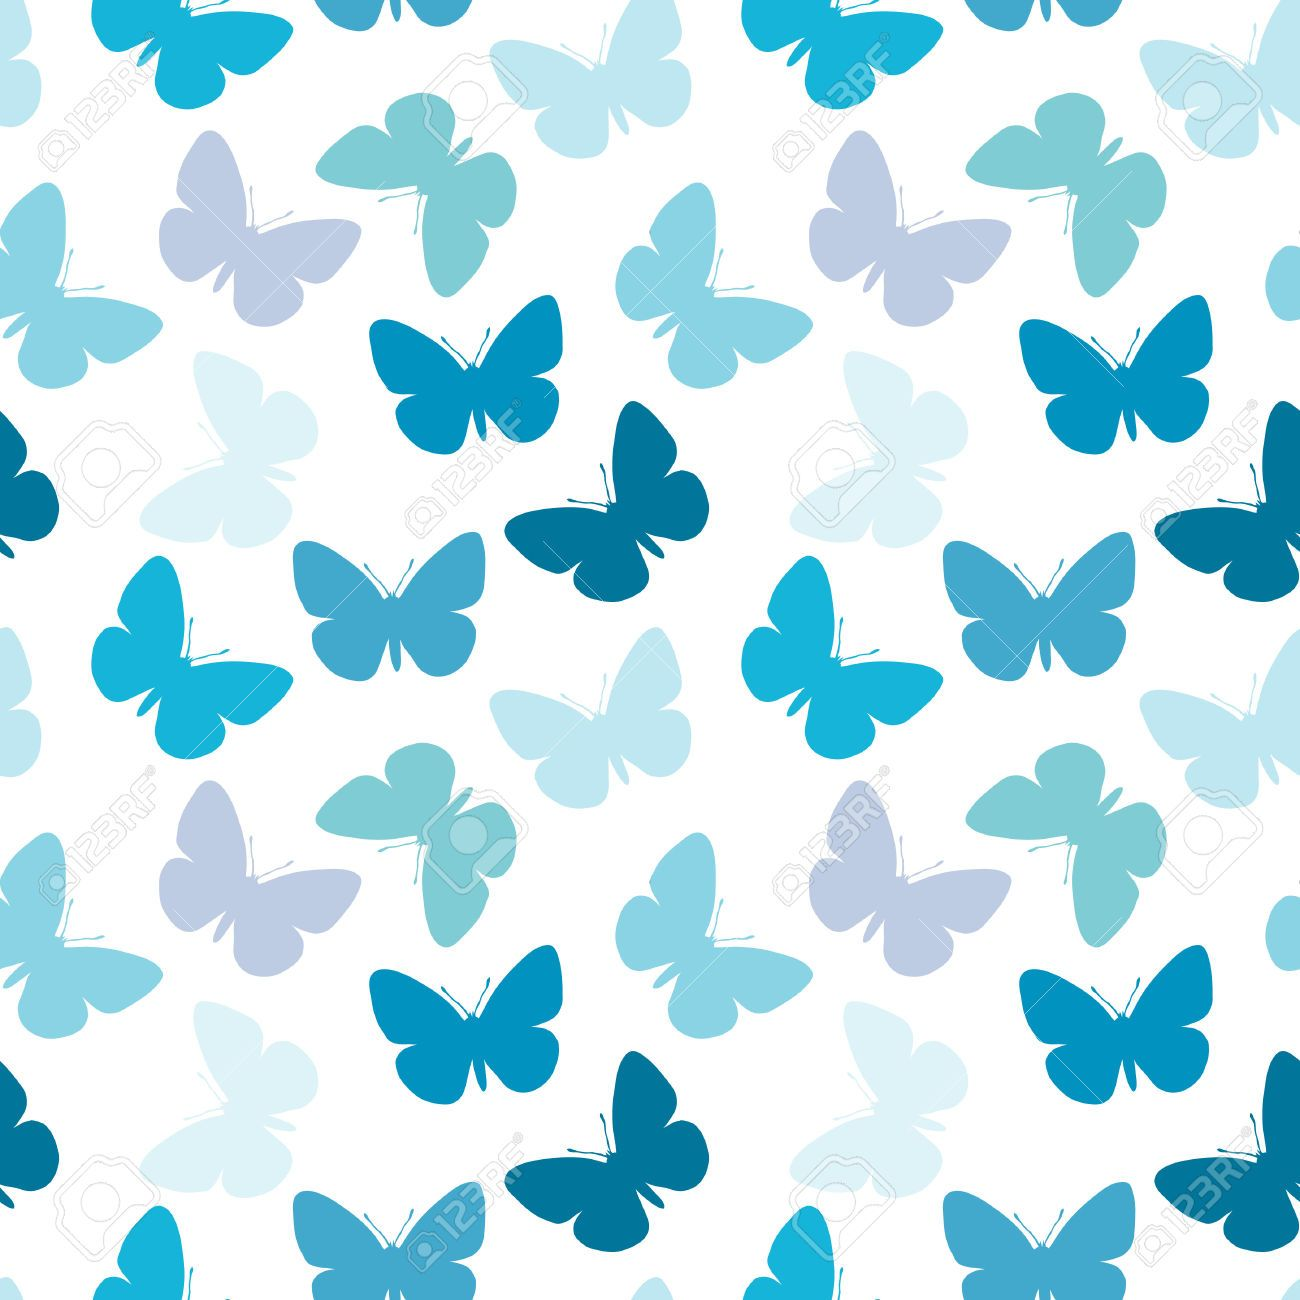 Butterfly Wallpapers Com HD Wallpapers Pinterest